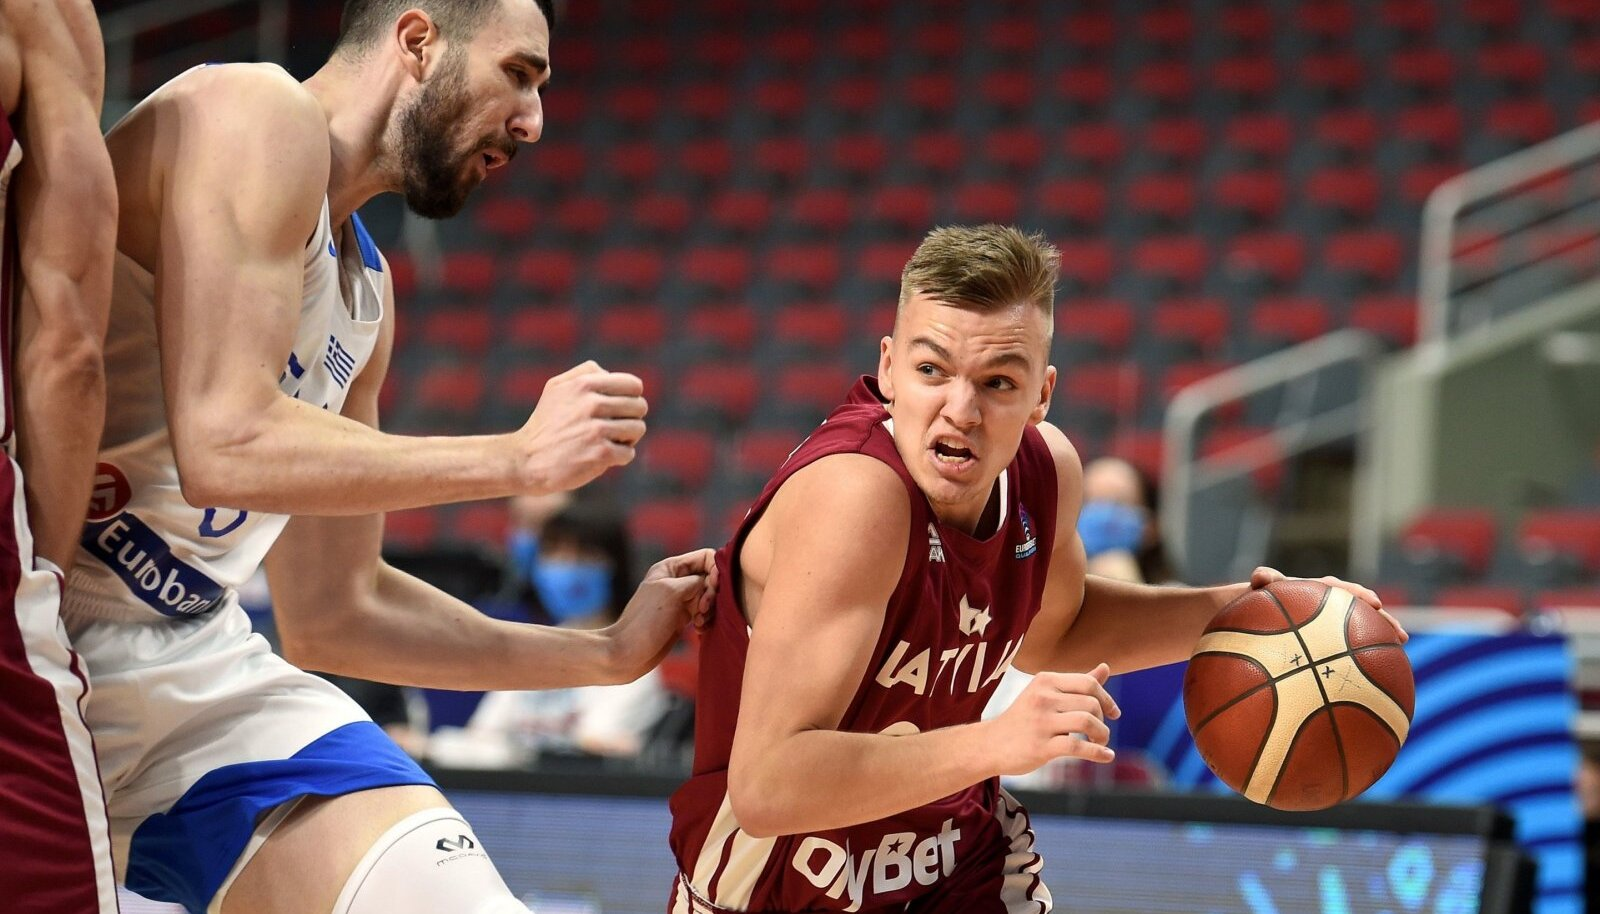 (SP)LATVIA-RIGA-BASKETBALL-FIBA EUROBASKET 2022 QUALIFIERS-LATVIA VS GREECE